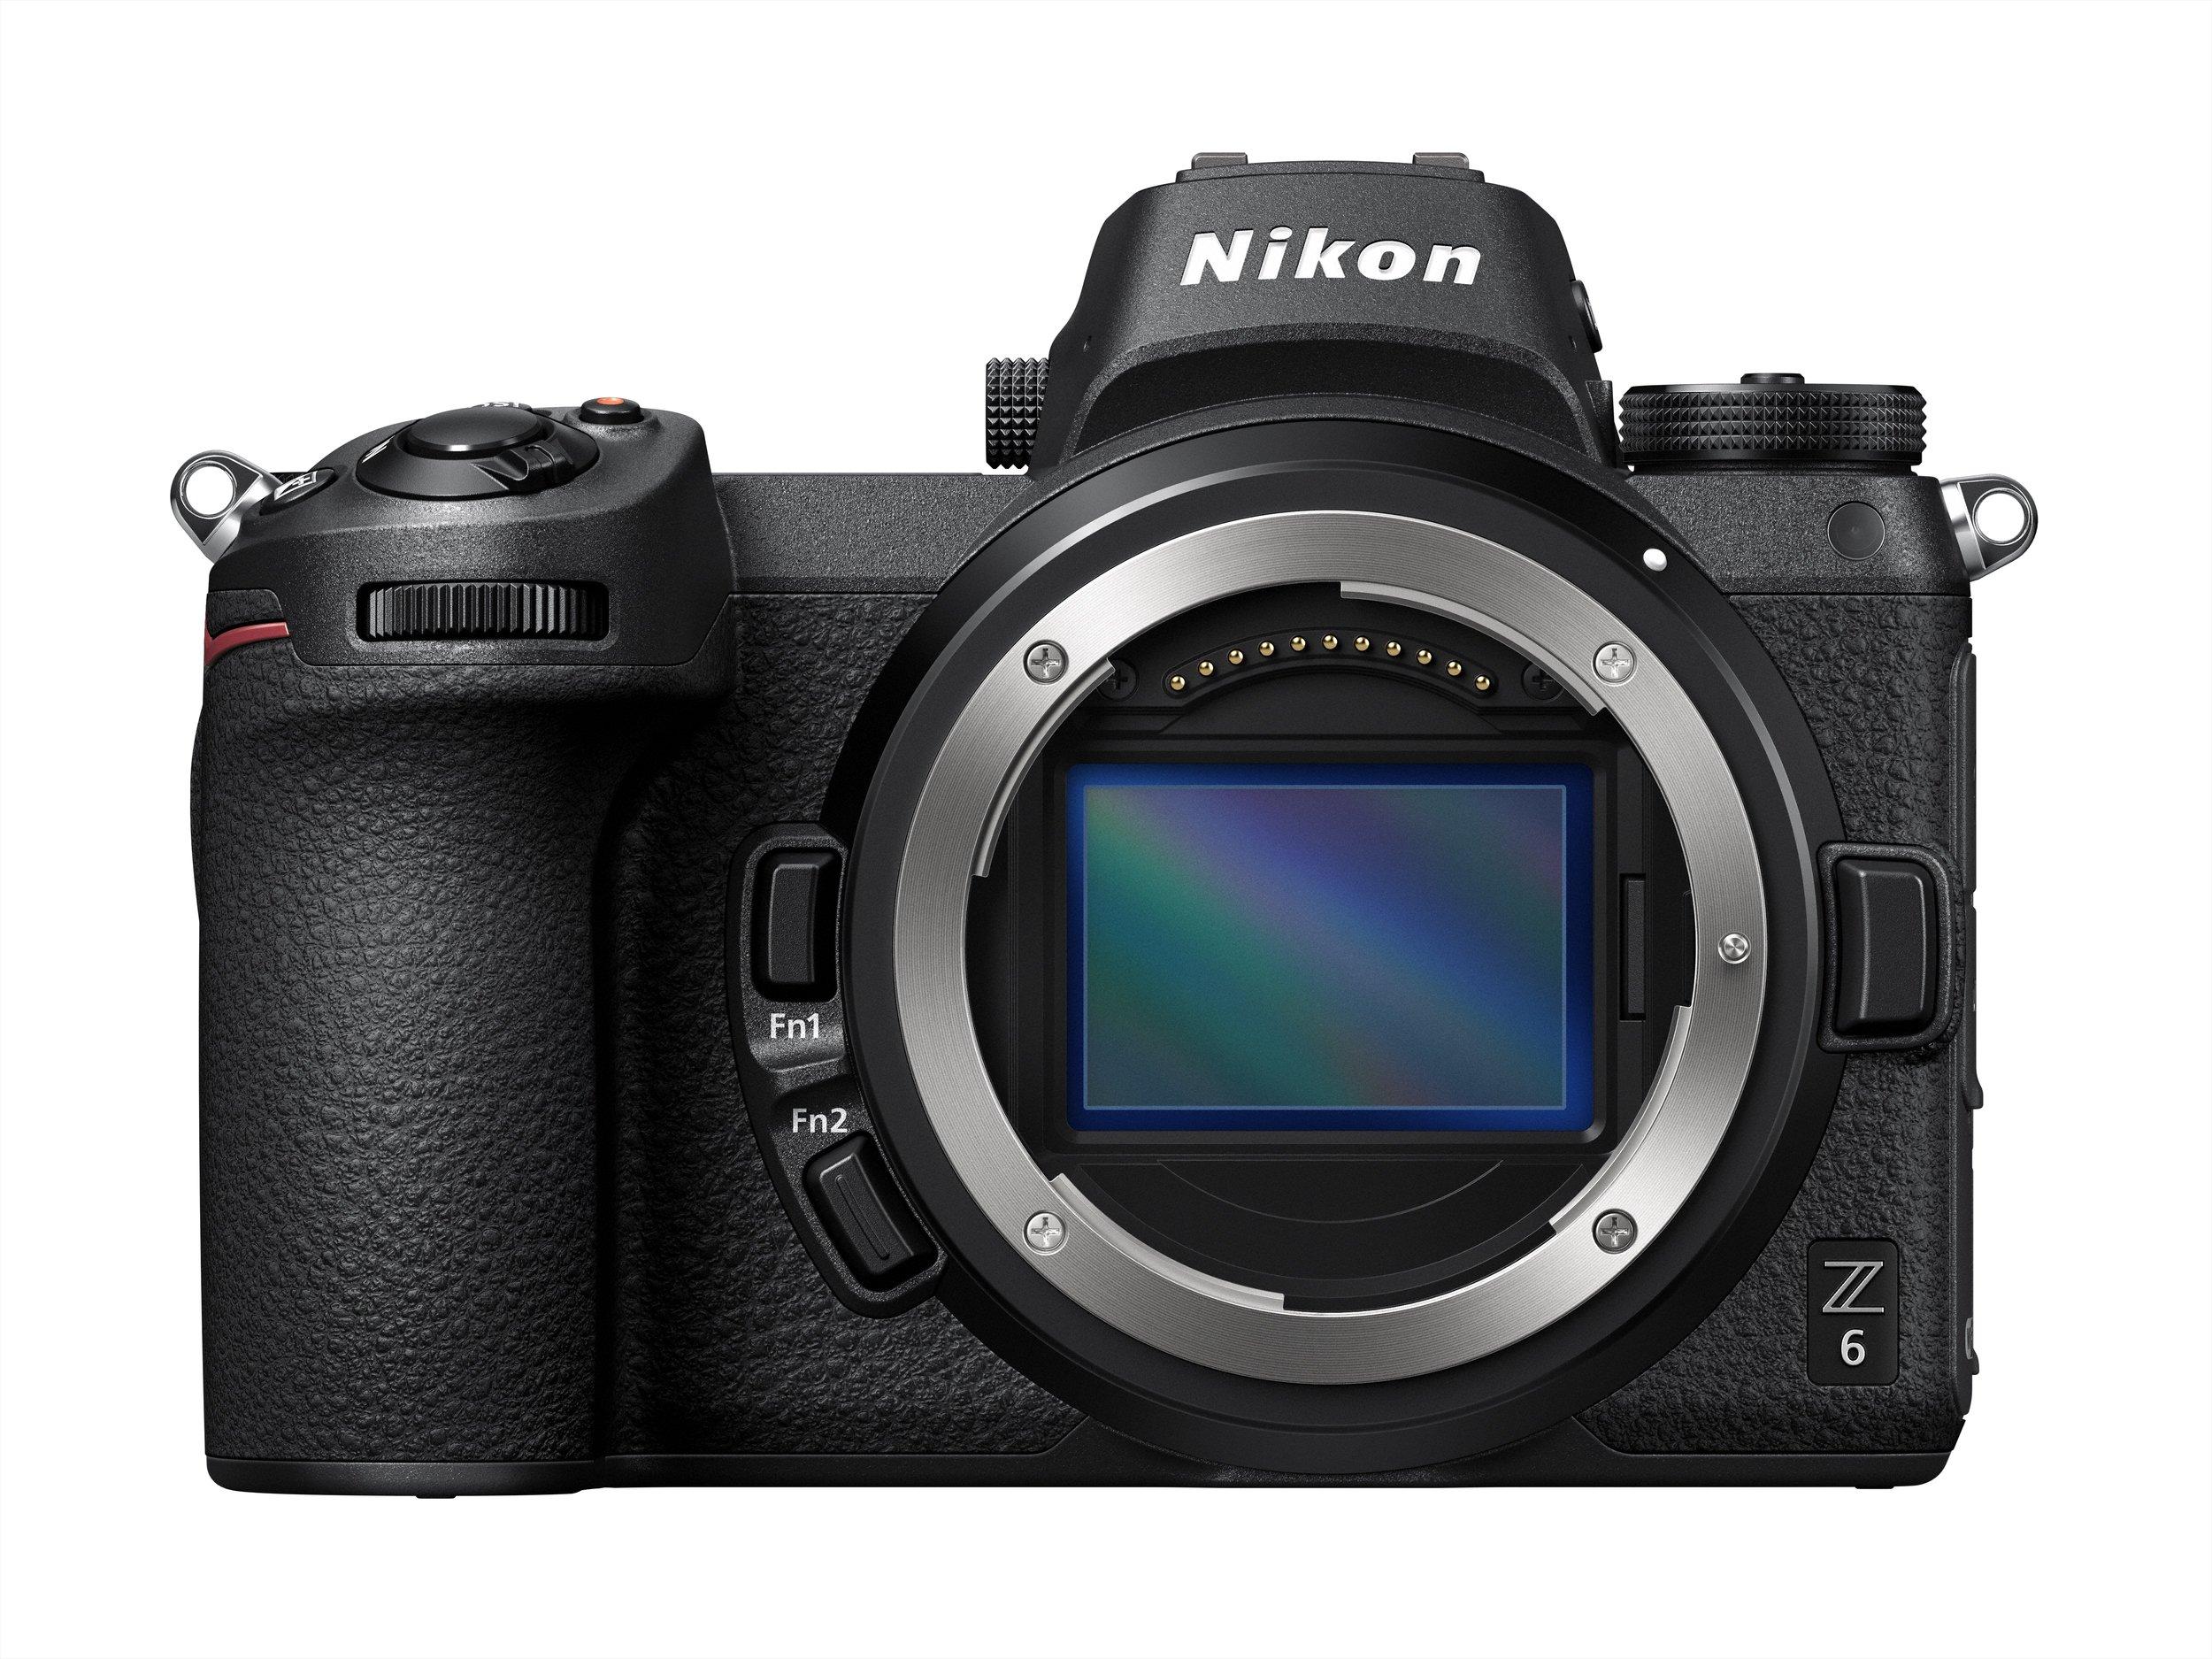 2018 08 24 Nikon 288141-Z6_front (1)-8e3362-original-1534959601.jpg